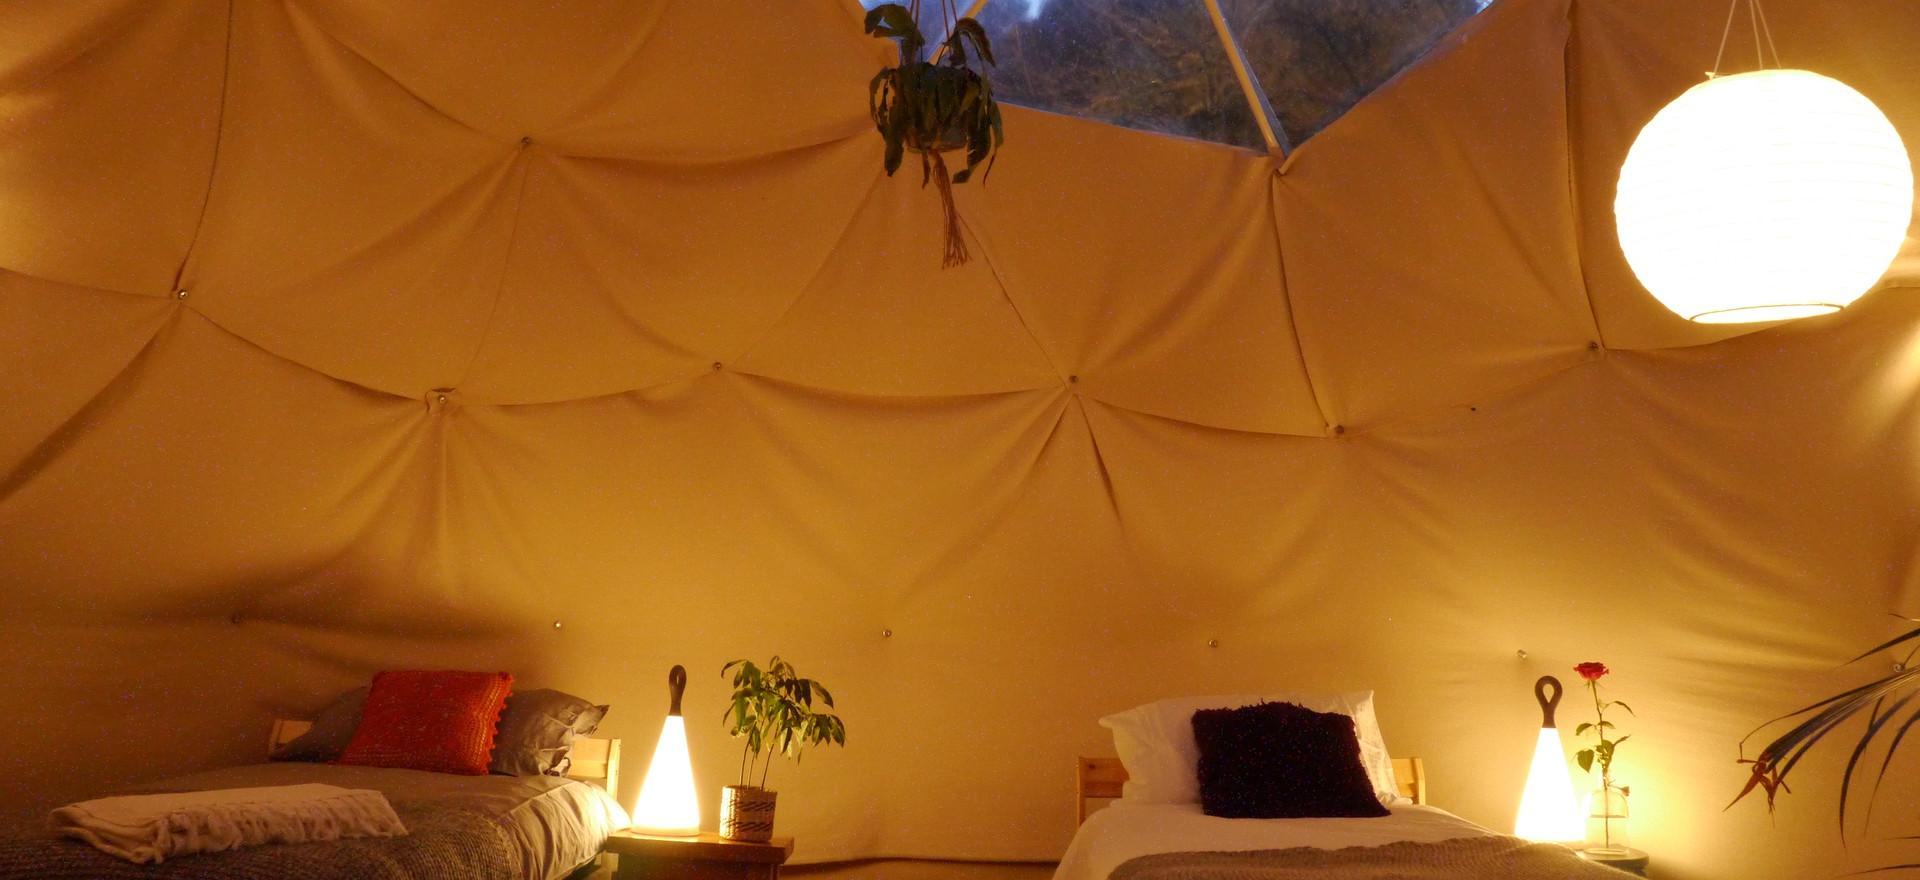 Dome NIght 1.JPG